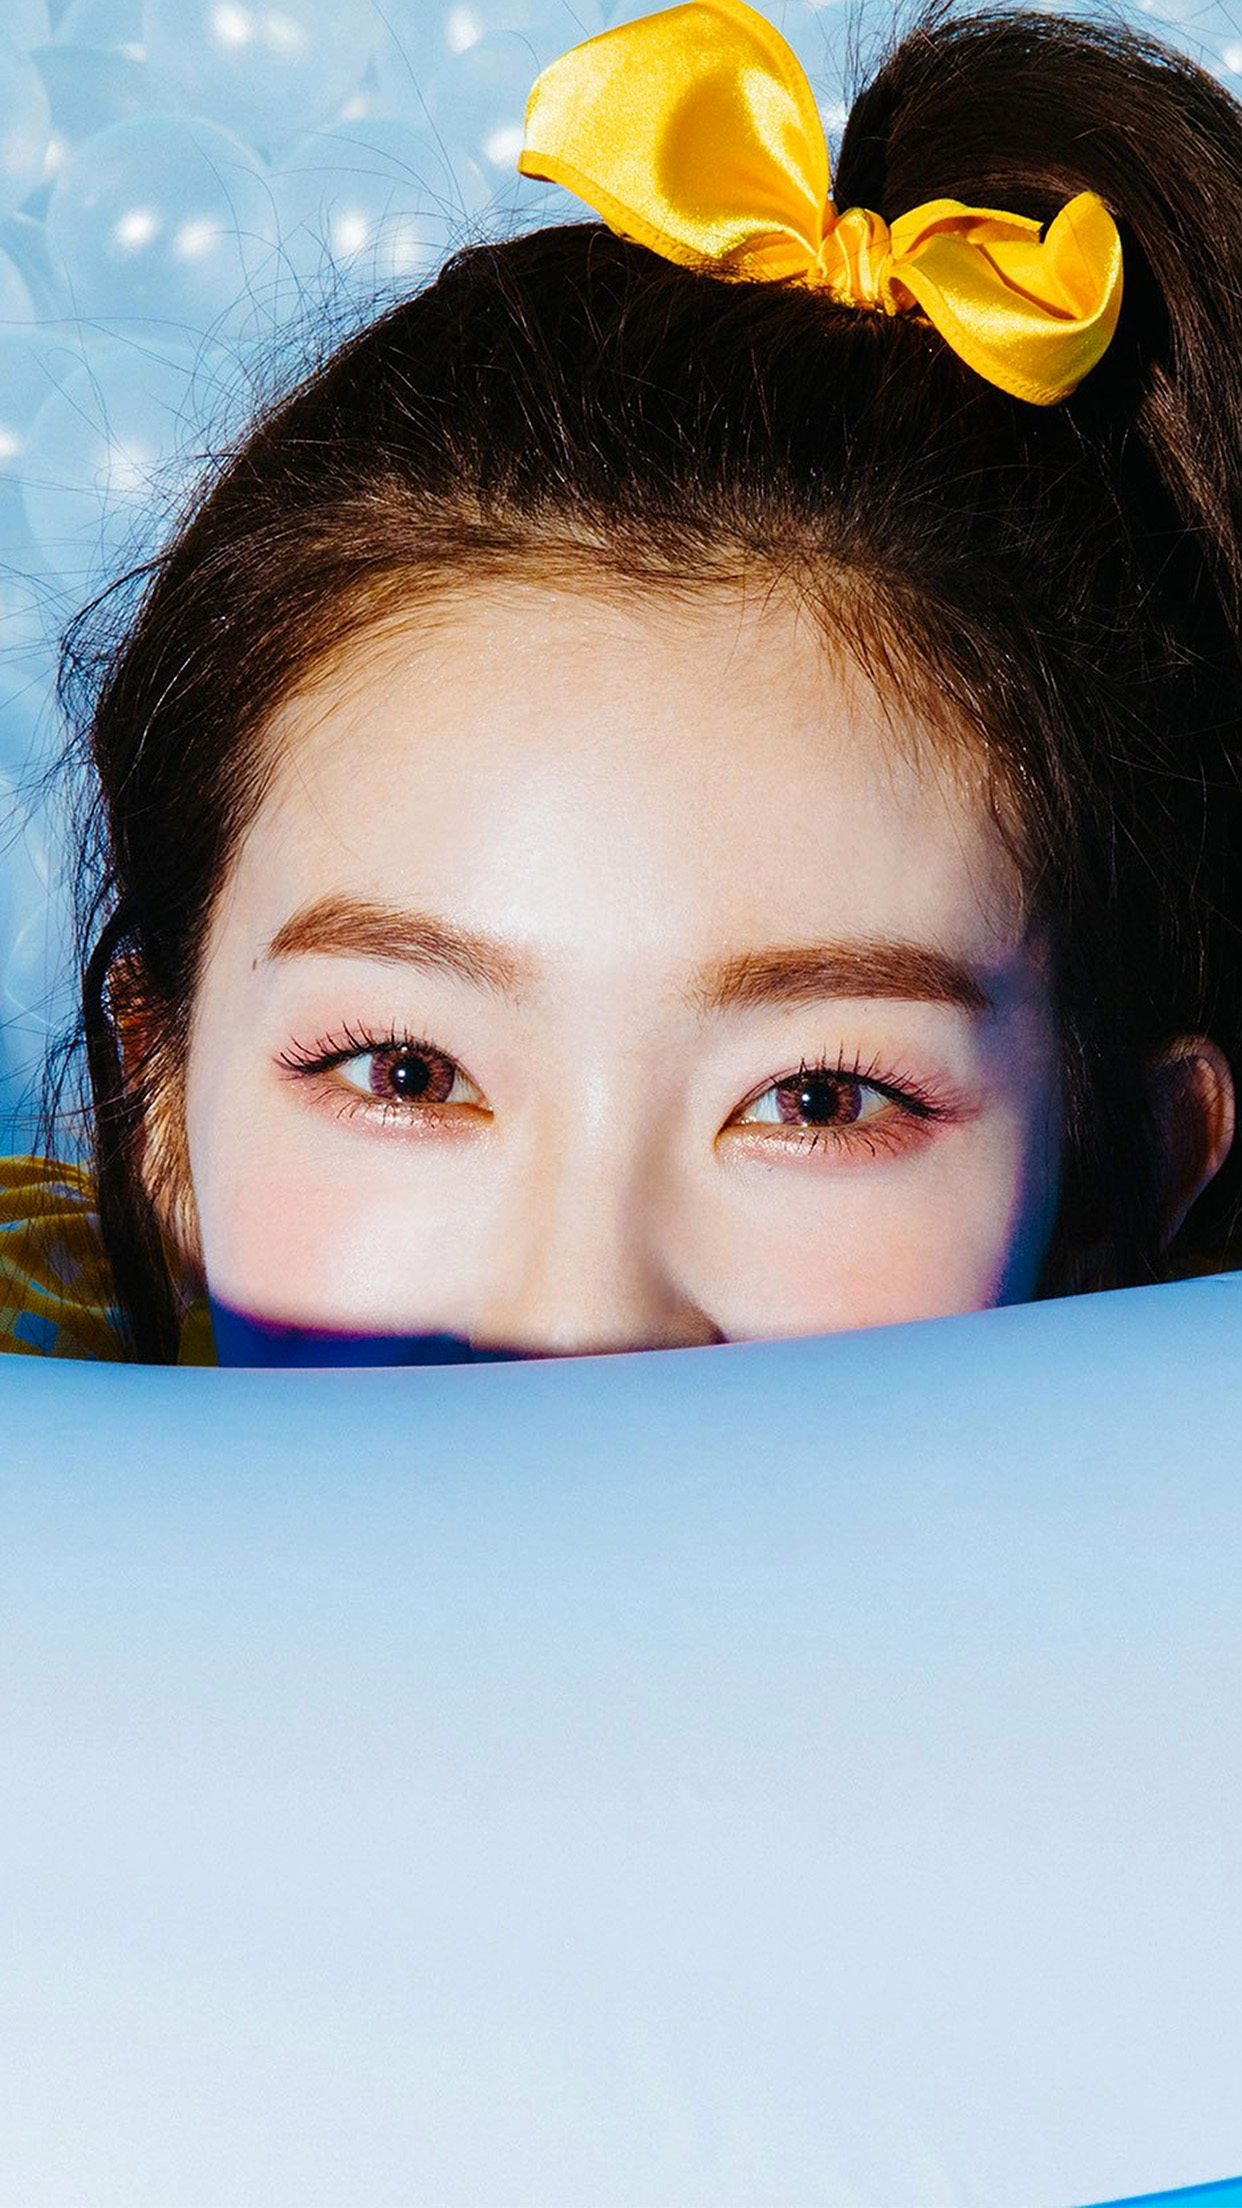 Red Velvet Irene Power Up 3164974 Hd Wallpaper Backgrounds Download